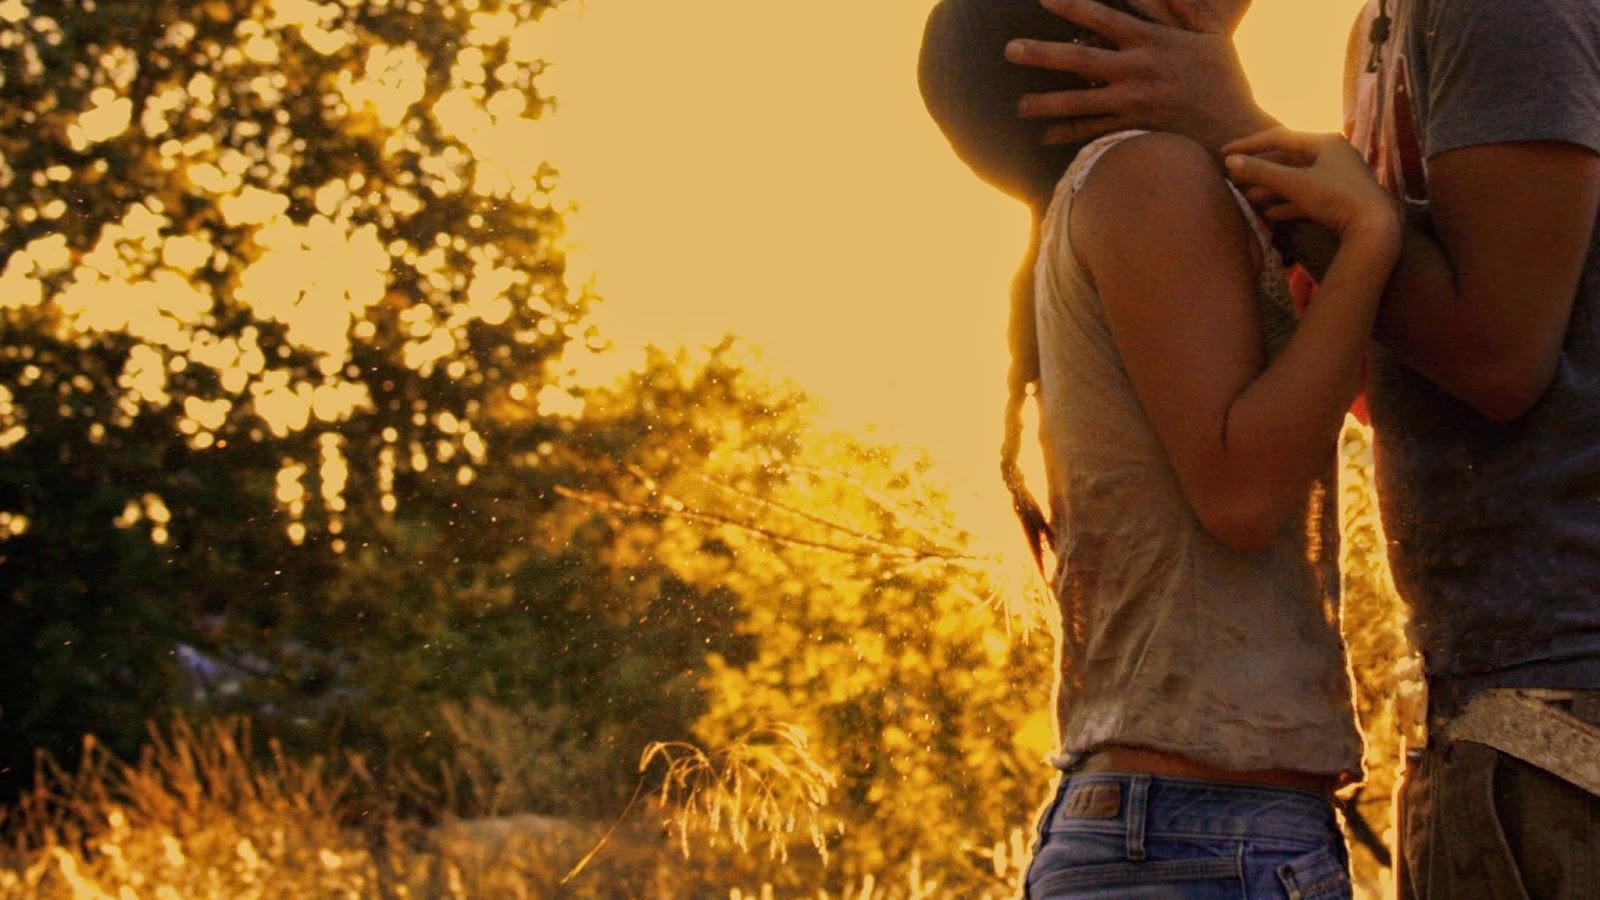 Lover images,love cute images,Romantic cute sweet couple images Nice love images, Love couple images, Real love images, Love cute images, Romantic images,  Hug Images, Lovely romantic images, 4truelovers images,Love cute images